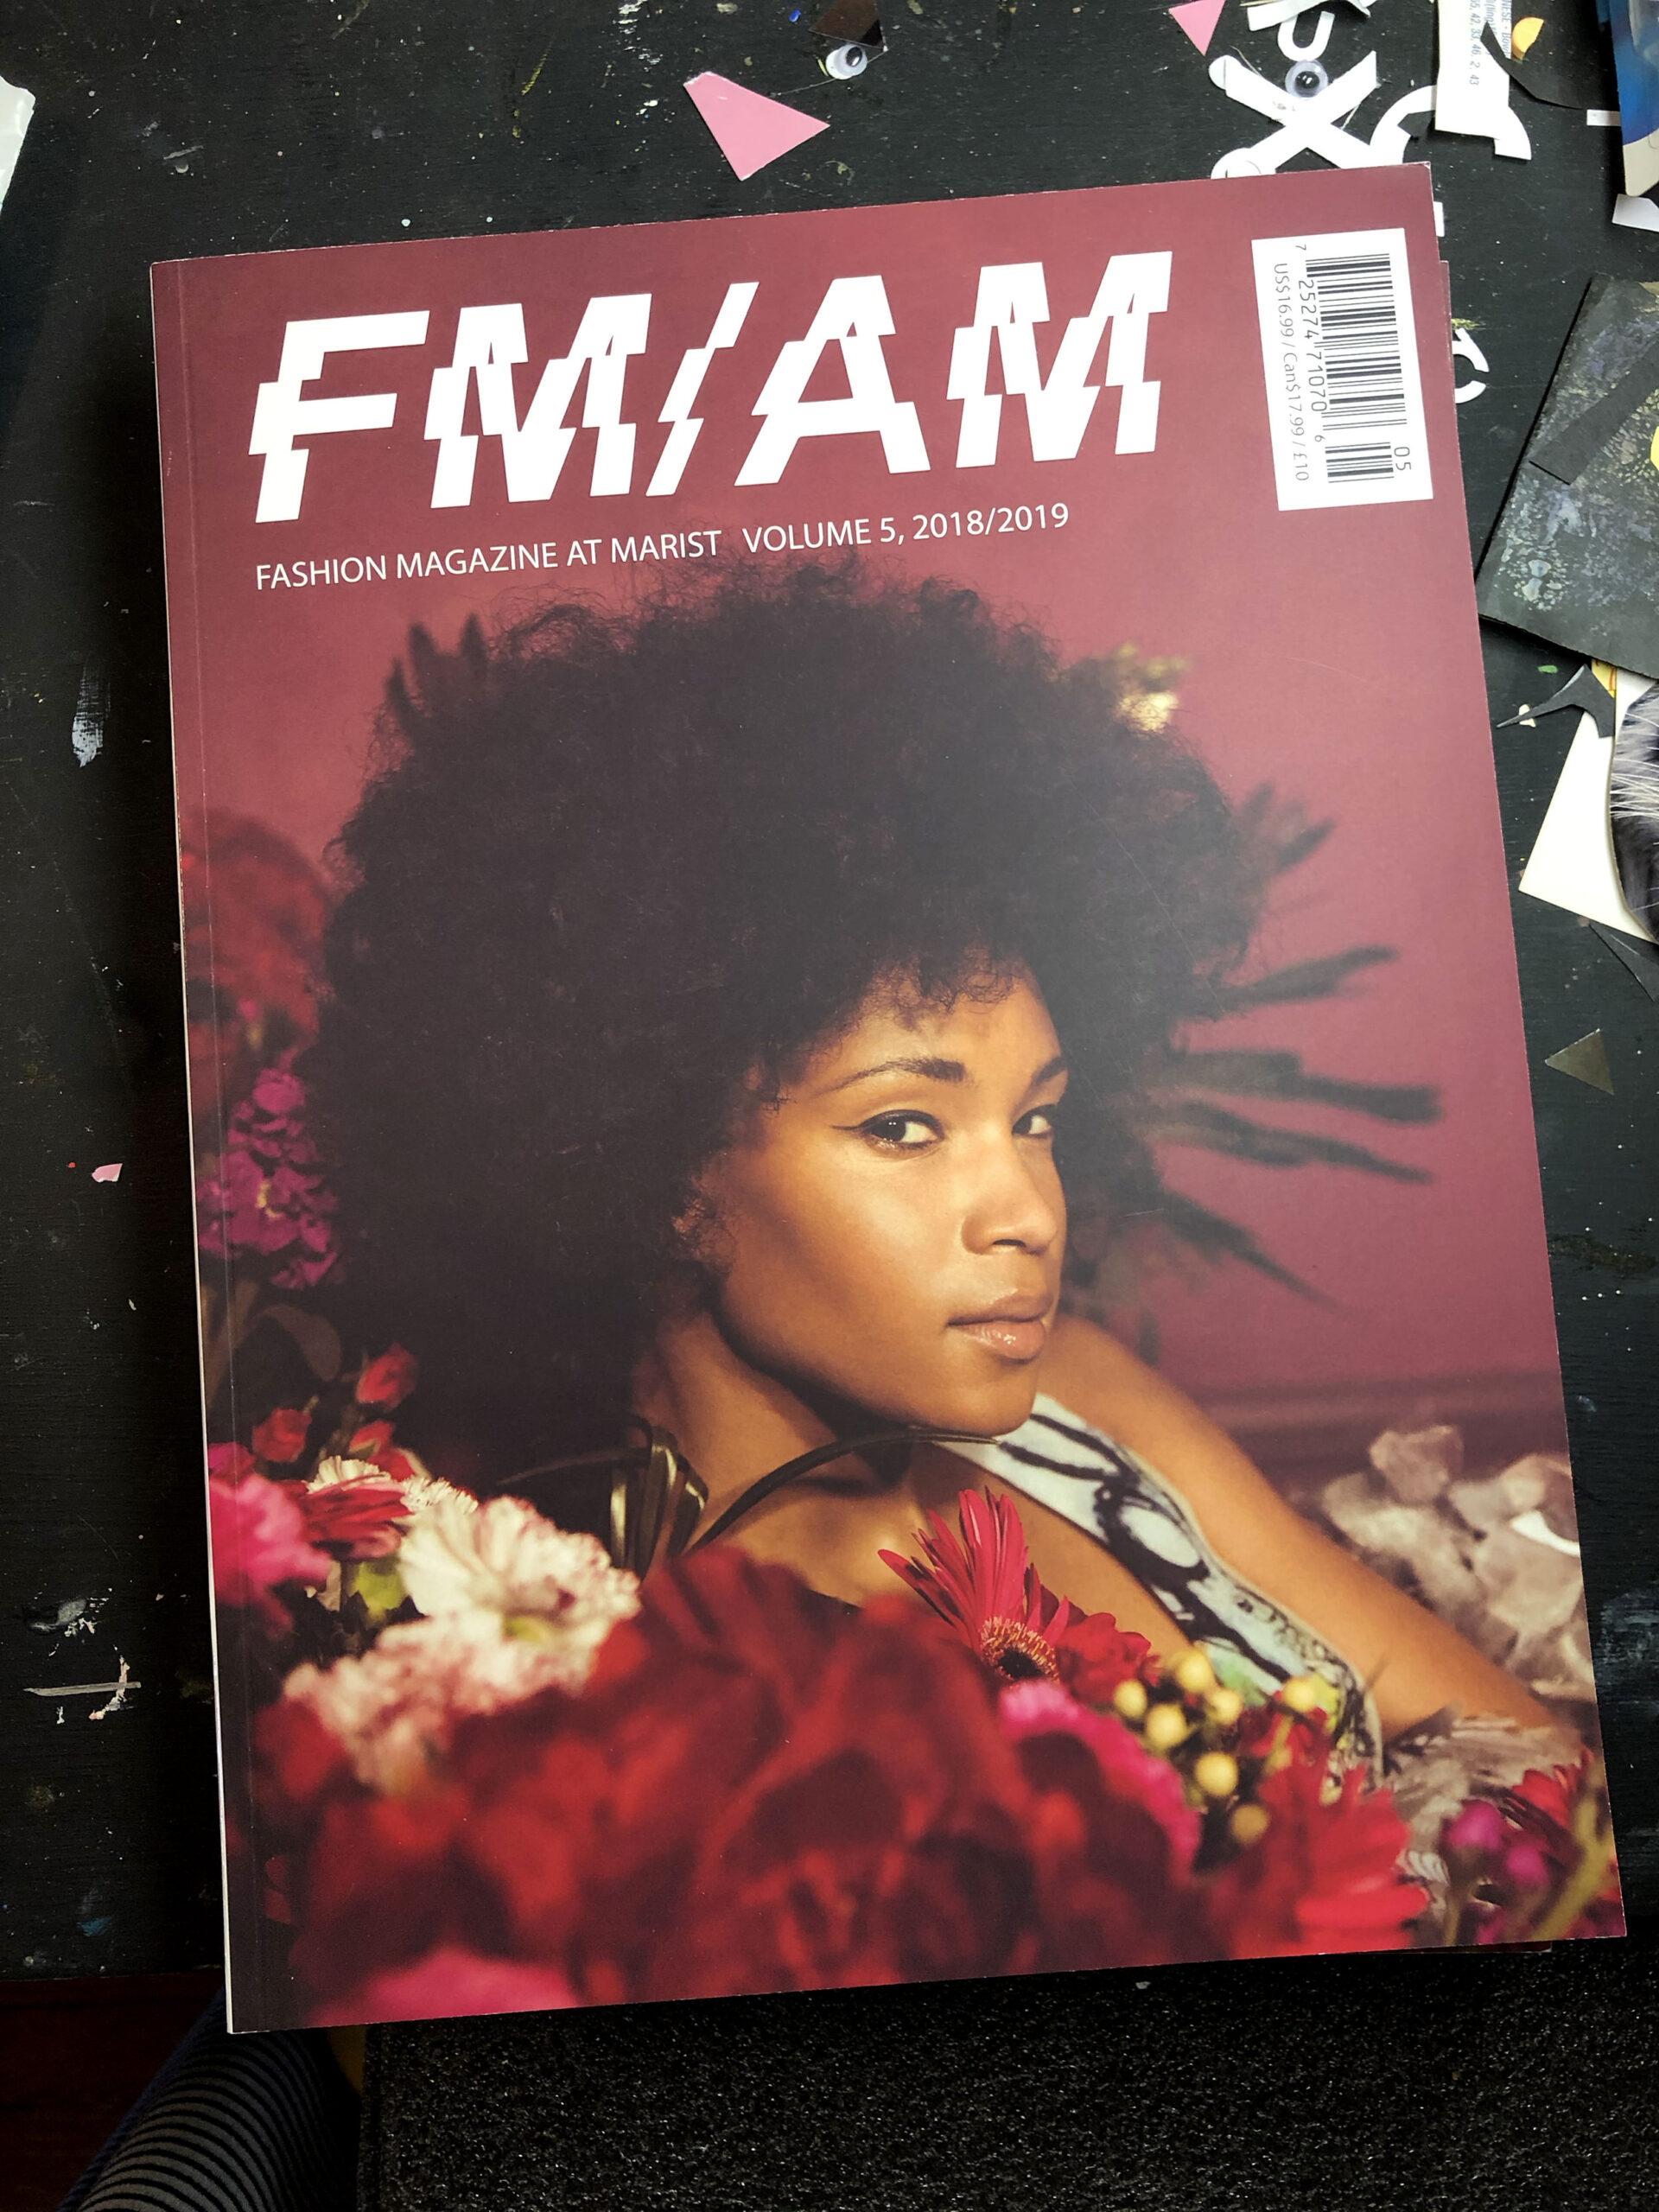 fm am vol 5 cover